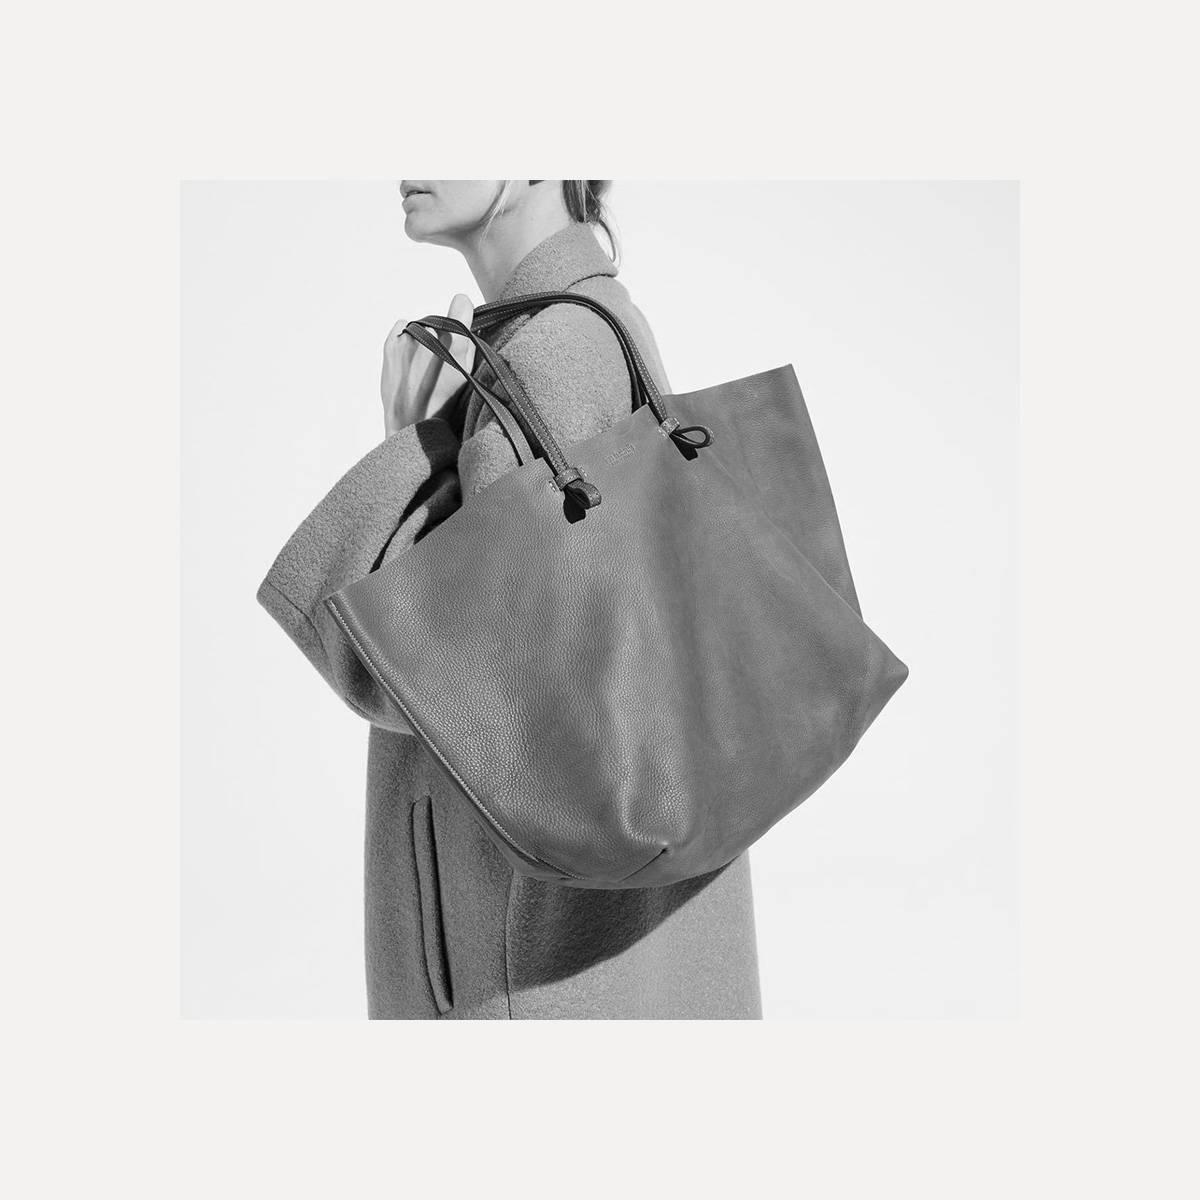 sac cabas cuir souple joy made in france bleu de chauffe. Black Bedroom Furniture Sets. Home Design Ideas